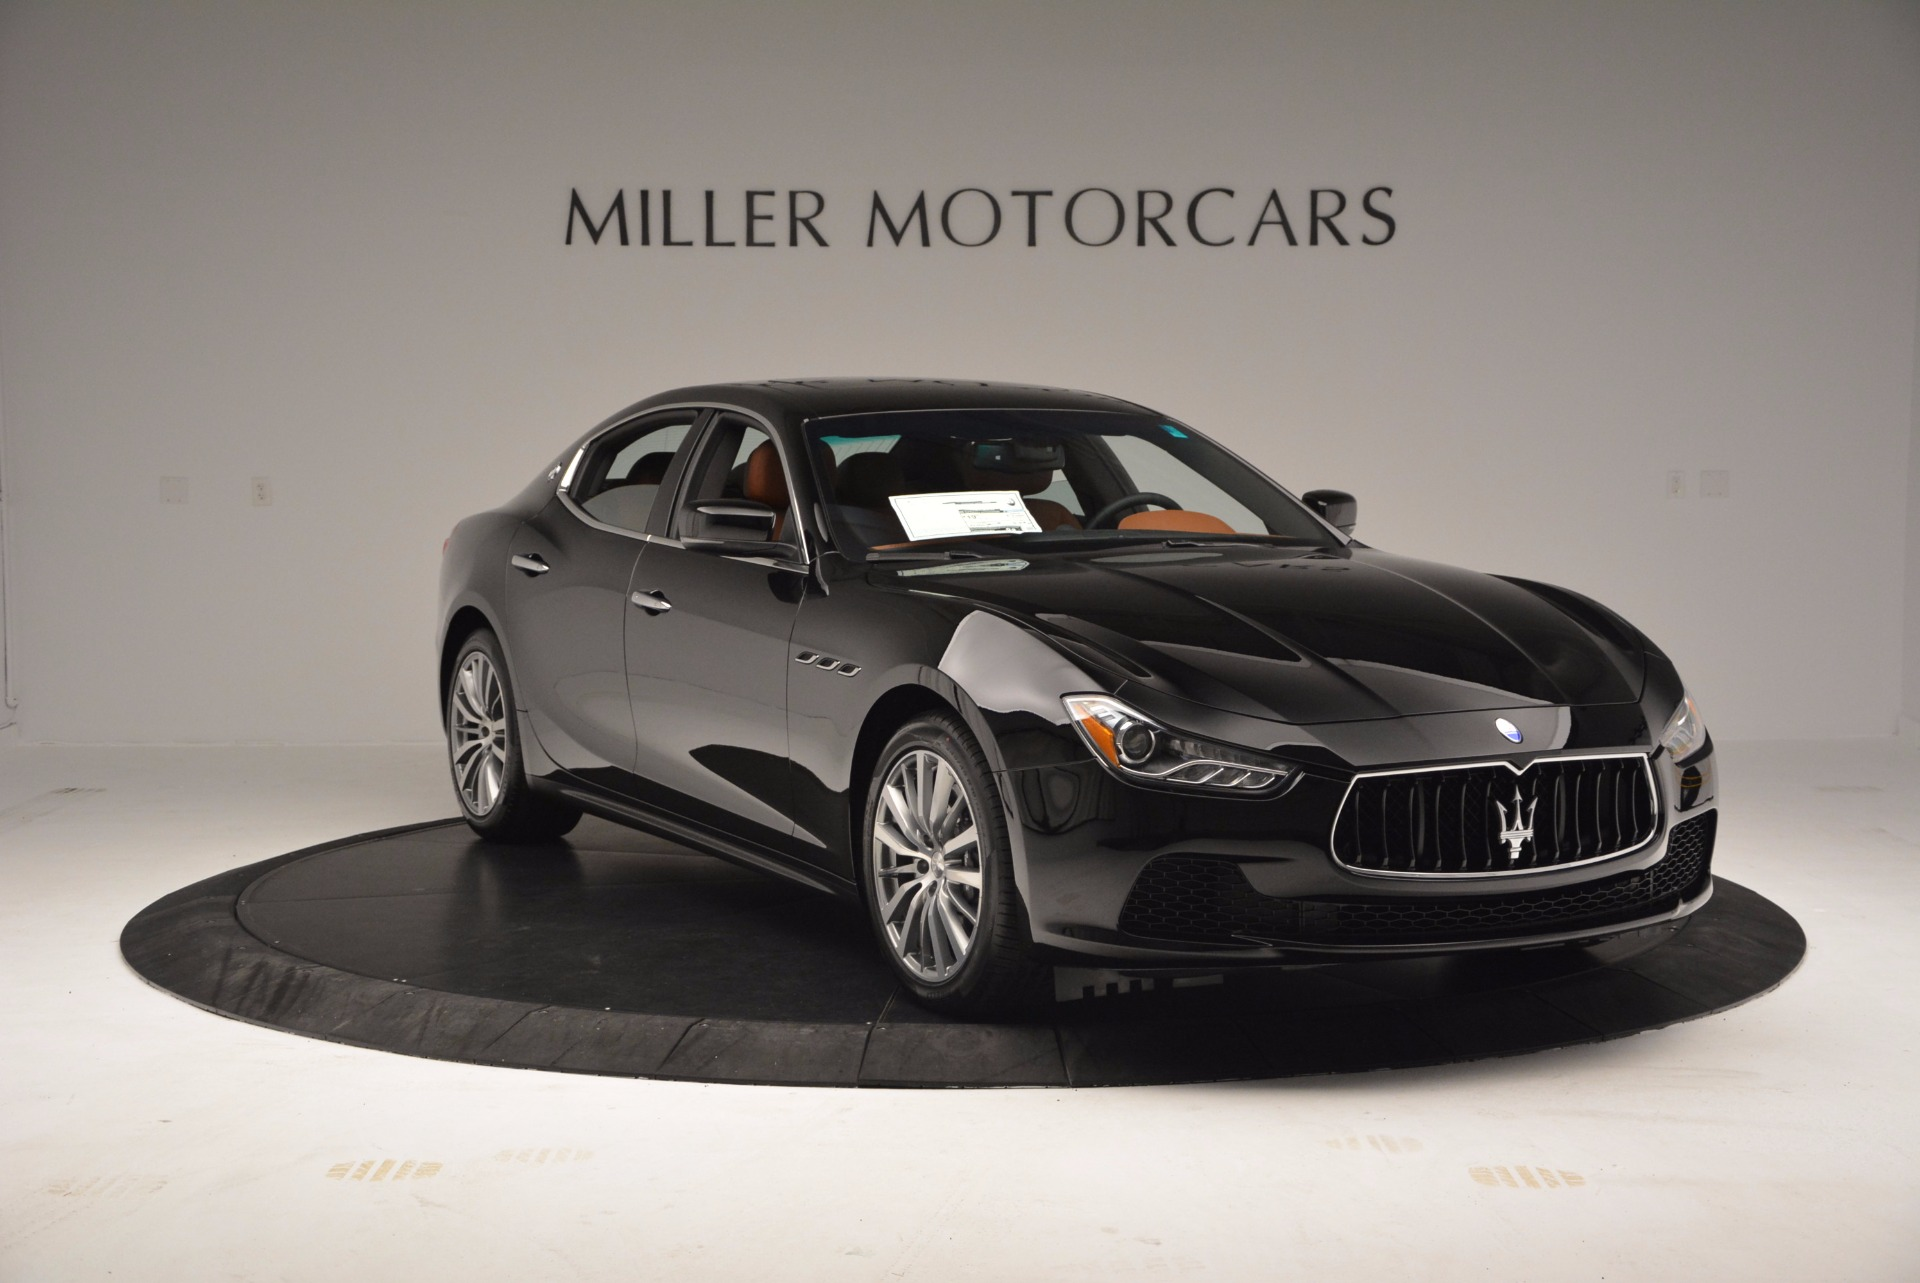 New 2017 Maserati Ghibli S Q4 EX-Loaner For Sale In Westport, CT 1116_p11